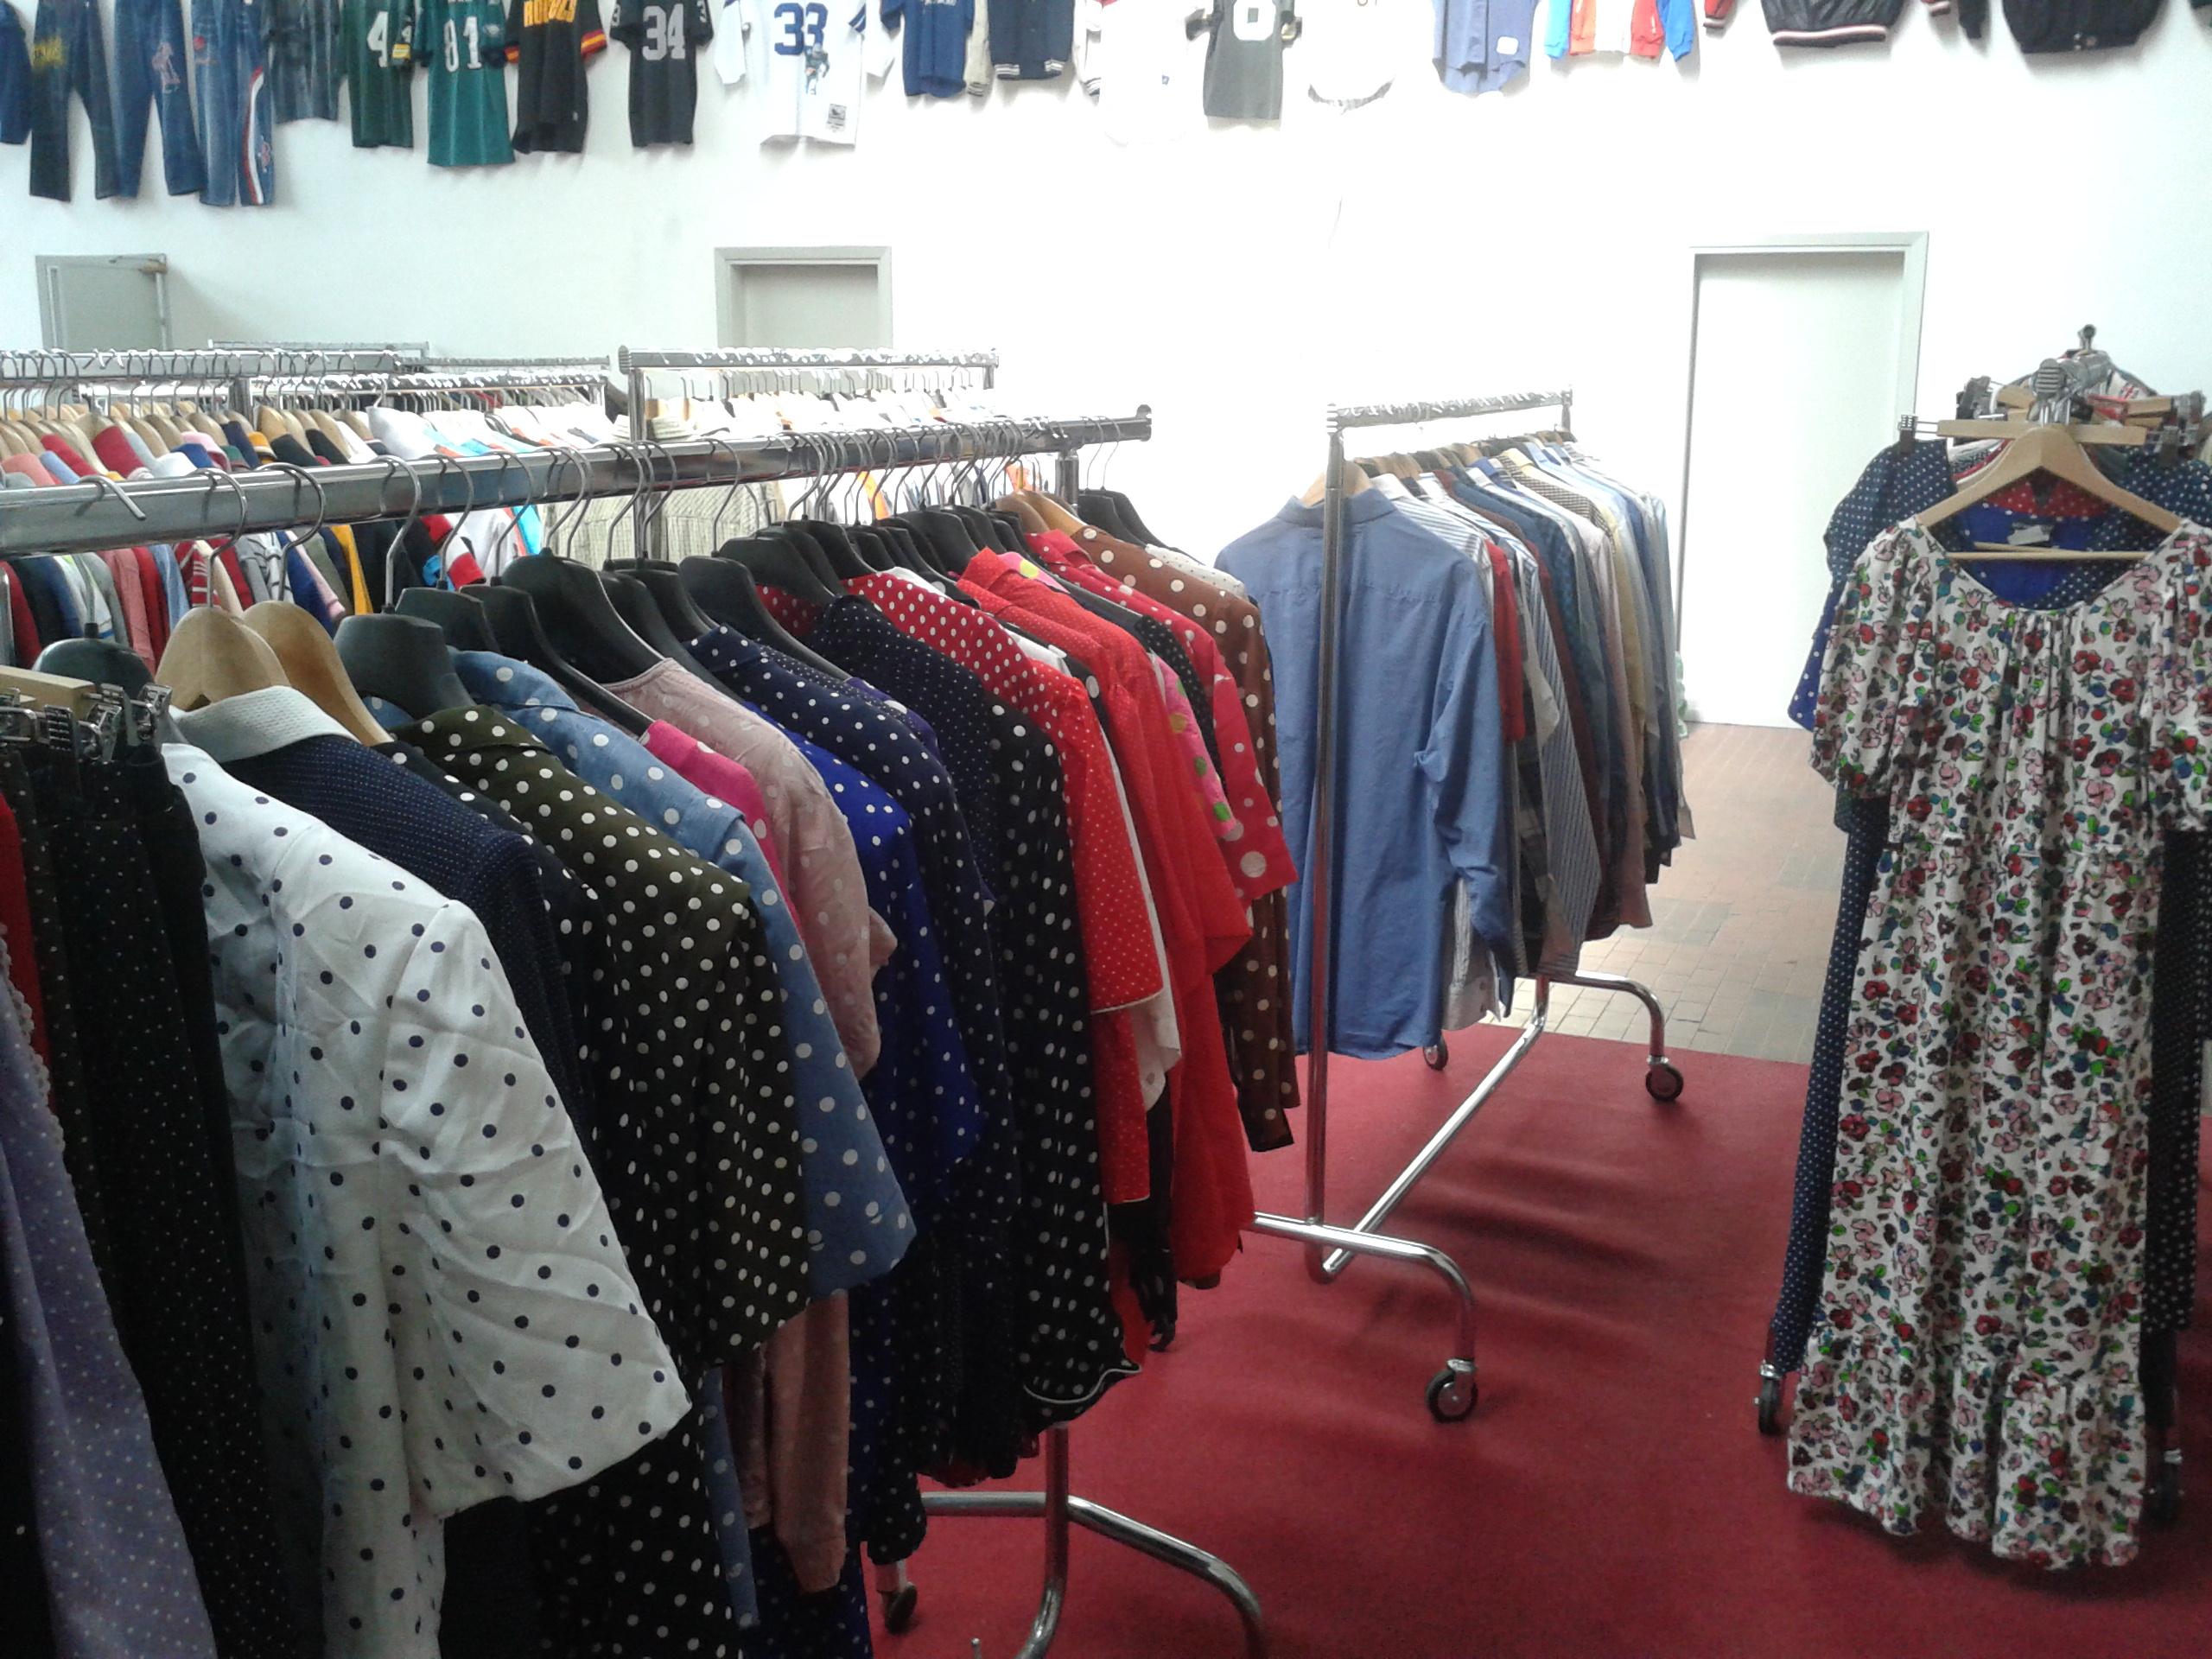 Ingrosso abbigliamento vintage Montemurlo Prato